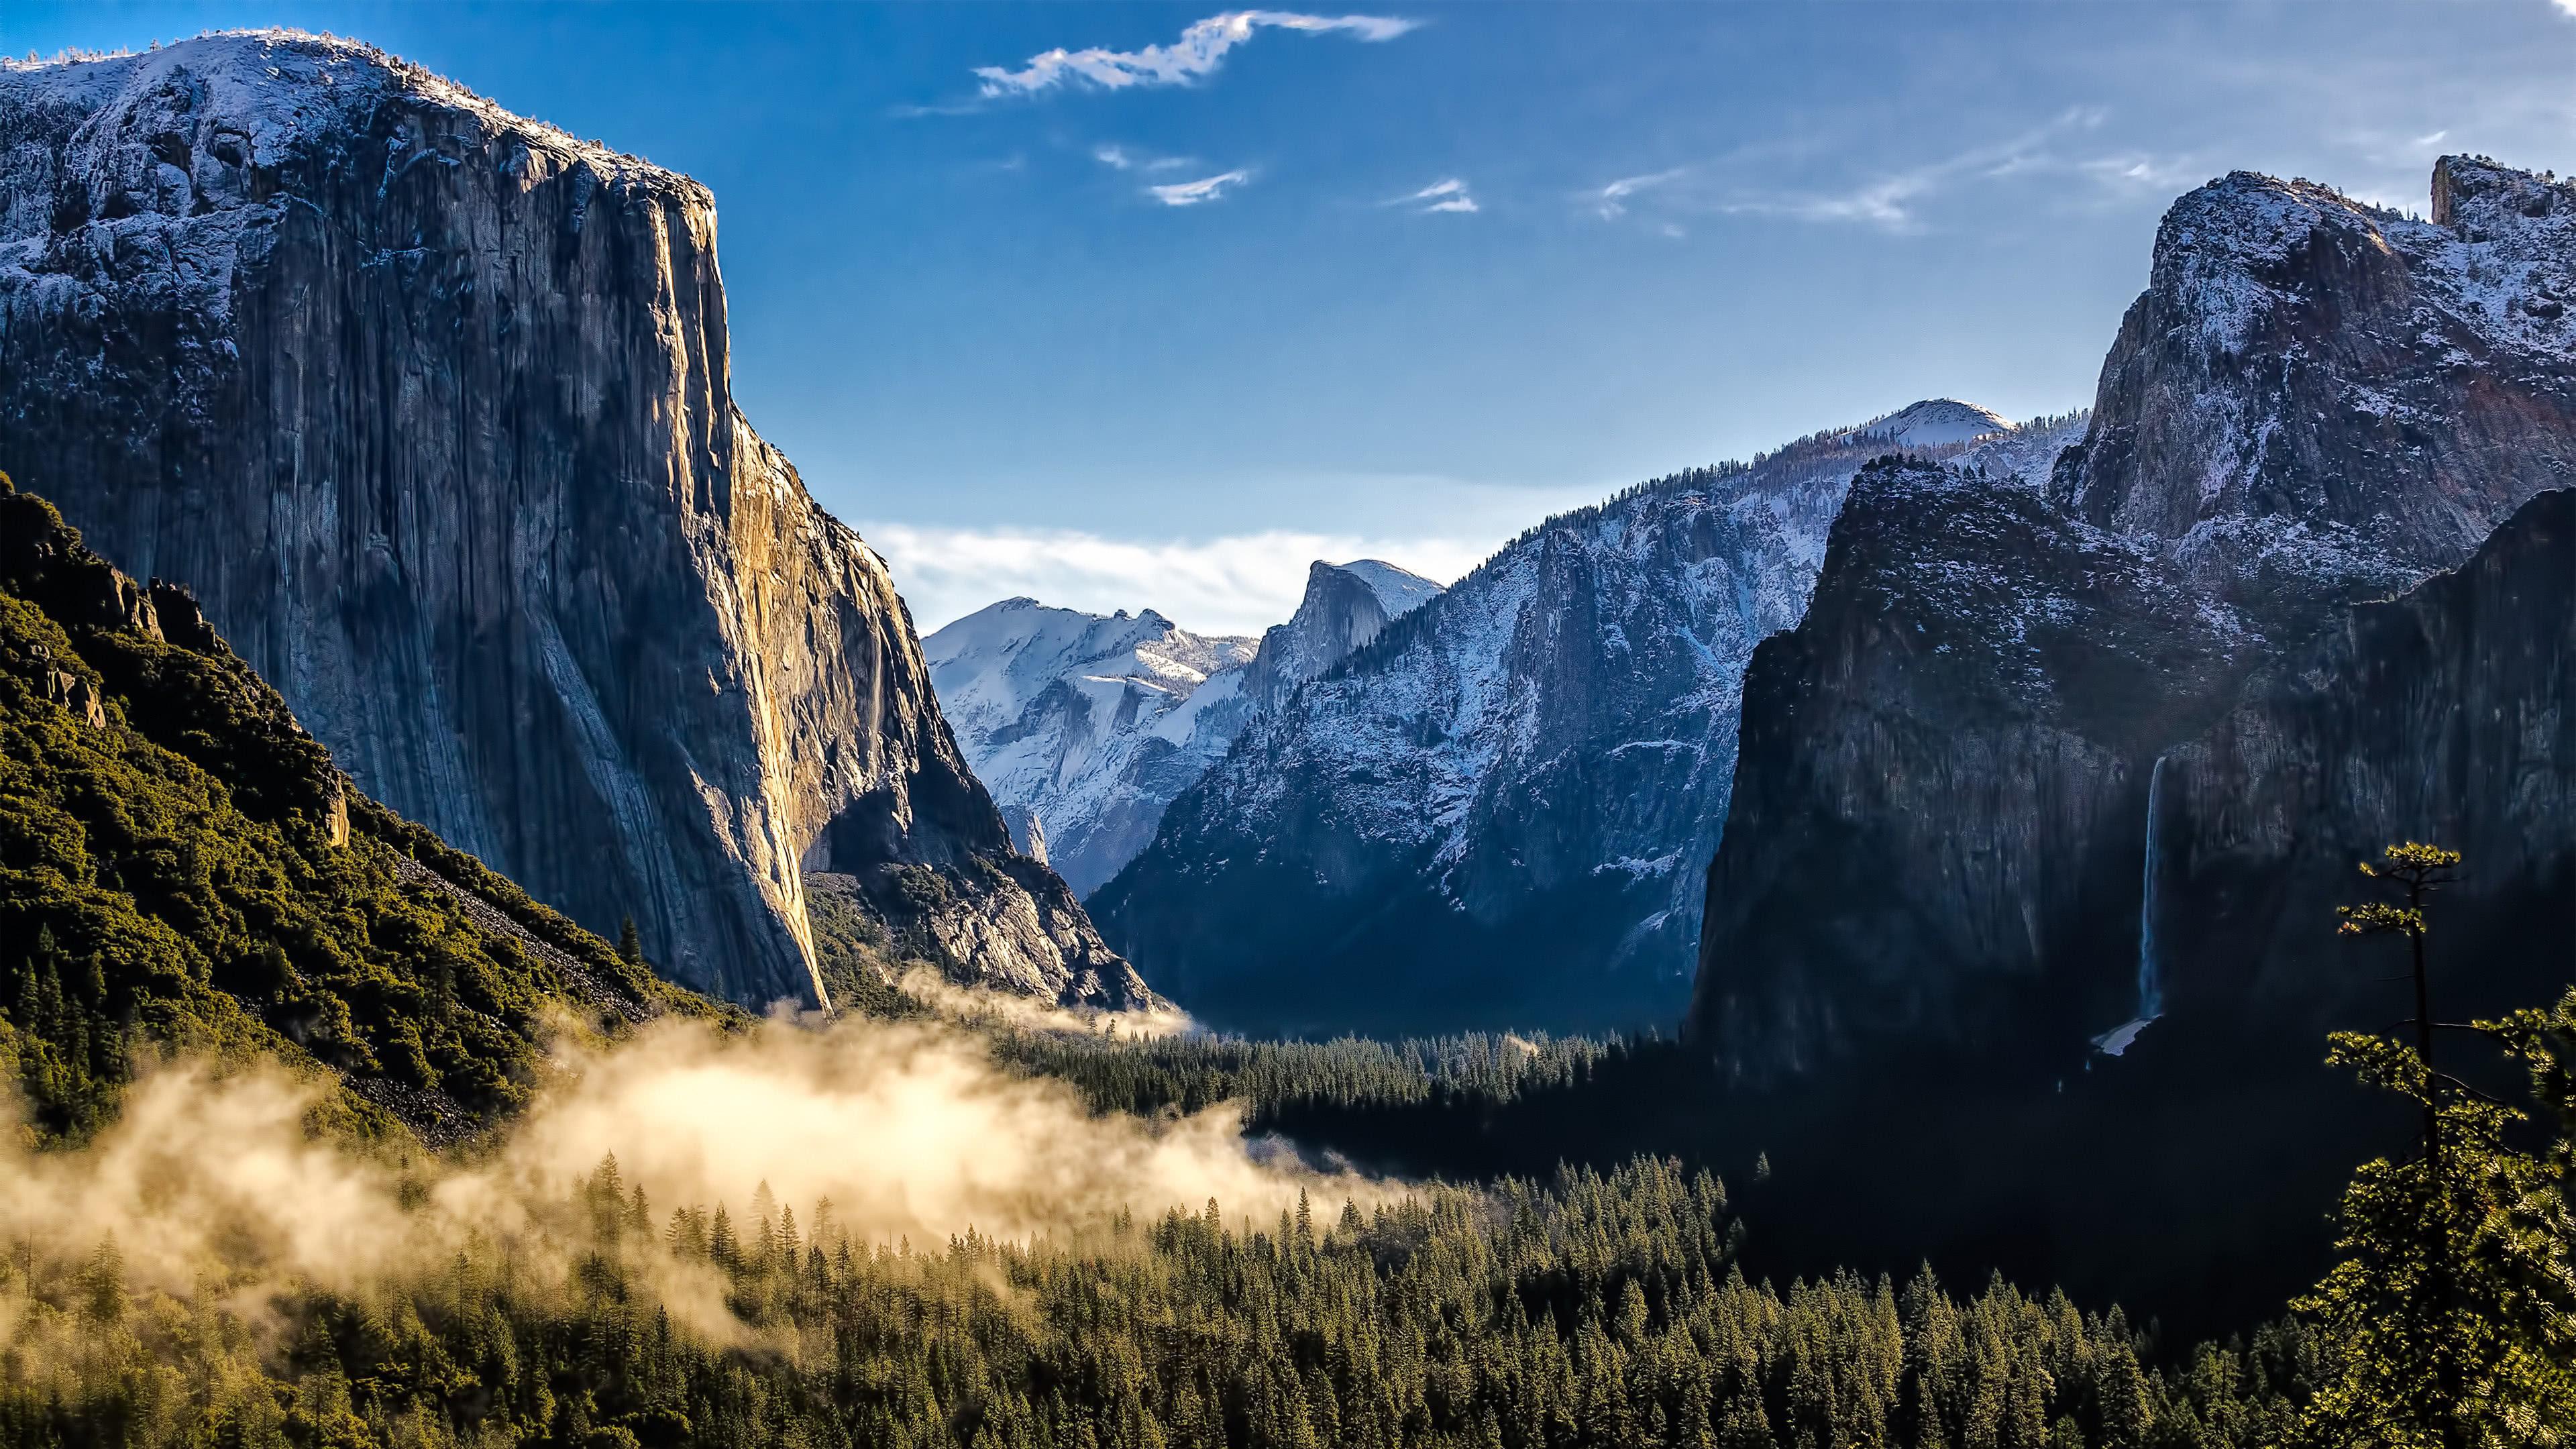 El Capitan Rock Formation, Yosemite National Park, California, United States 4k UHD [3840 X 2160]